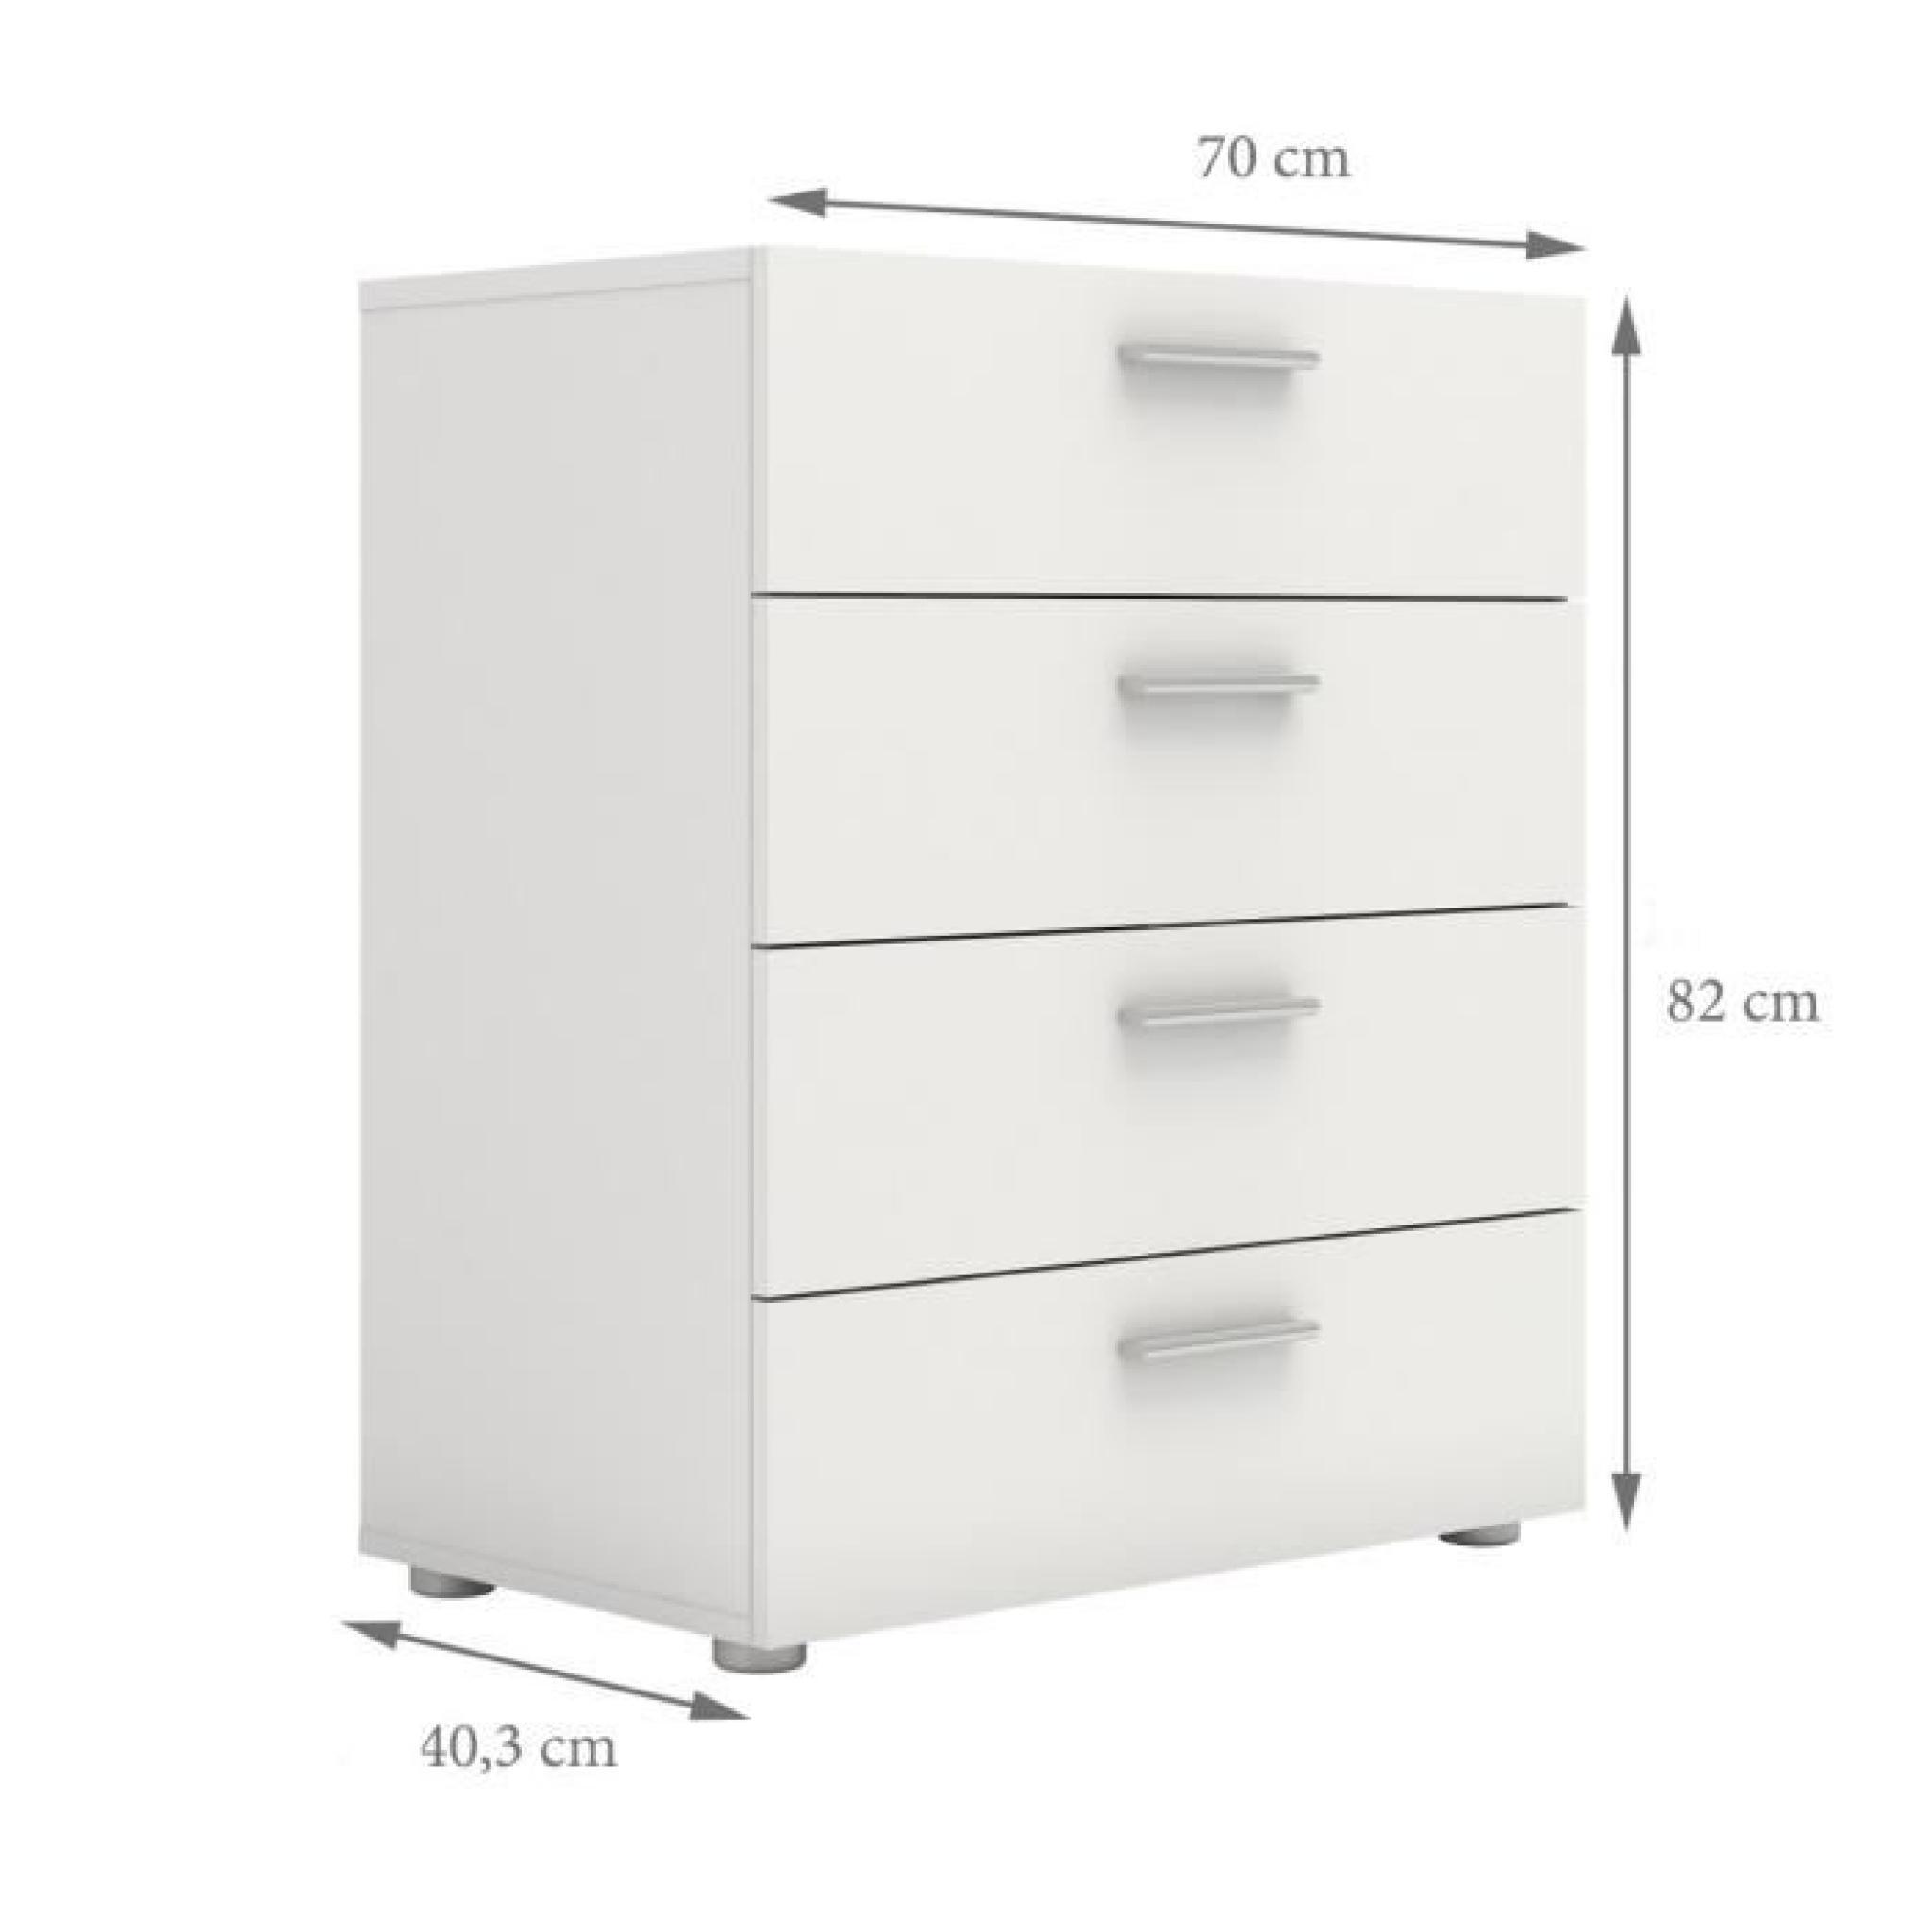 pepe commode 70x40 x82 cm blanc achat vente commode pas. Black Bedroom Furniture Sets. Home Design Ideas